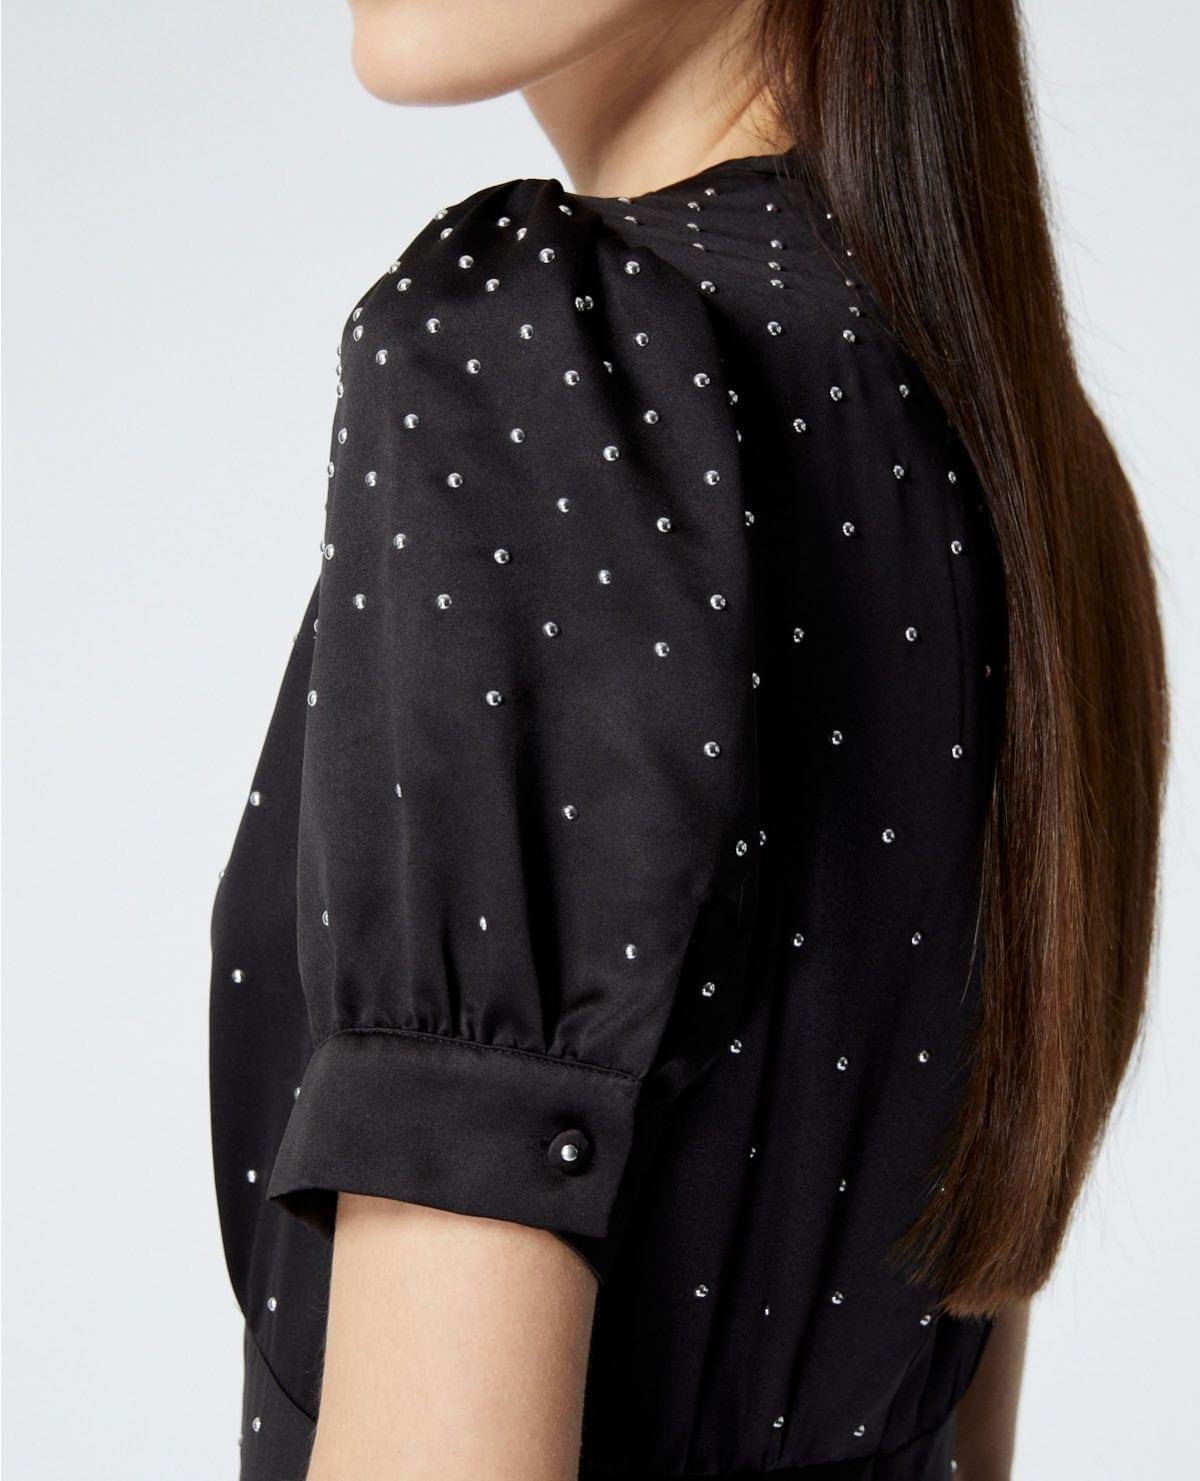 THE KOOPLES Satin Long Black Studs Dress